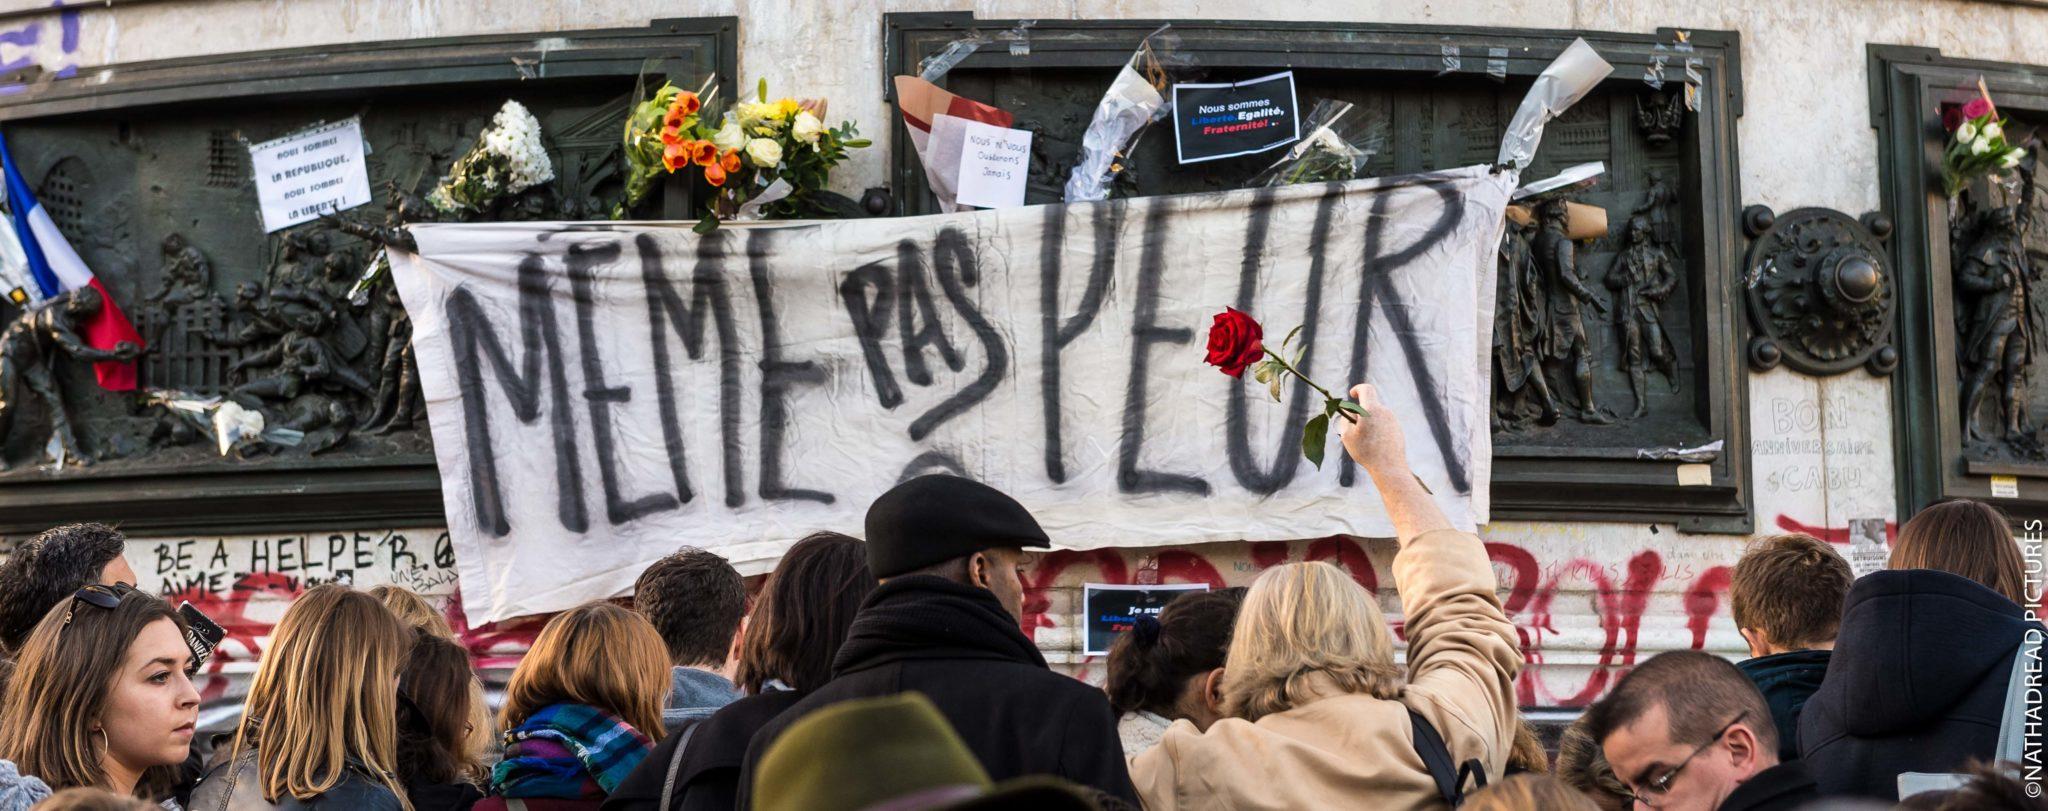 Attentats, Paris 2015